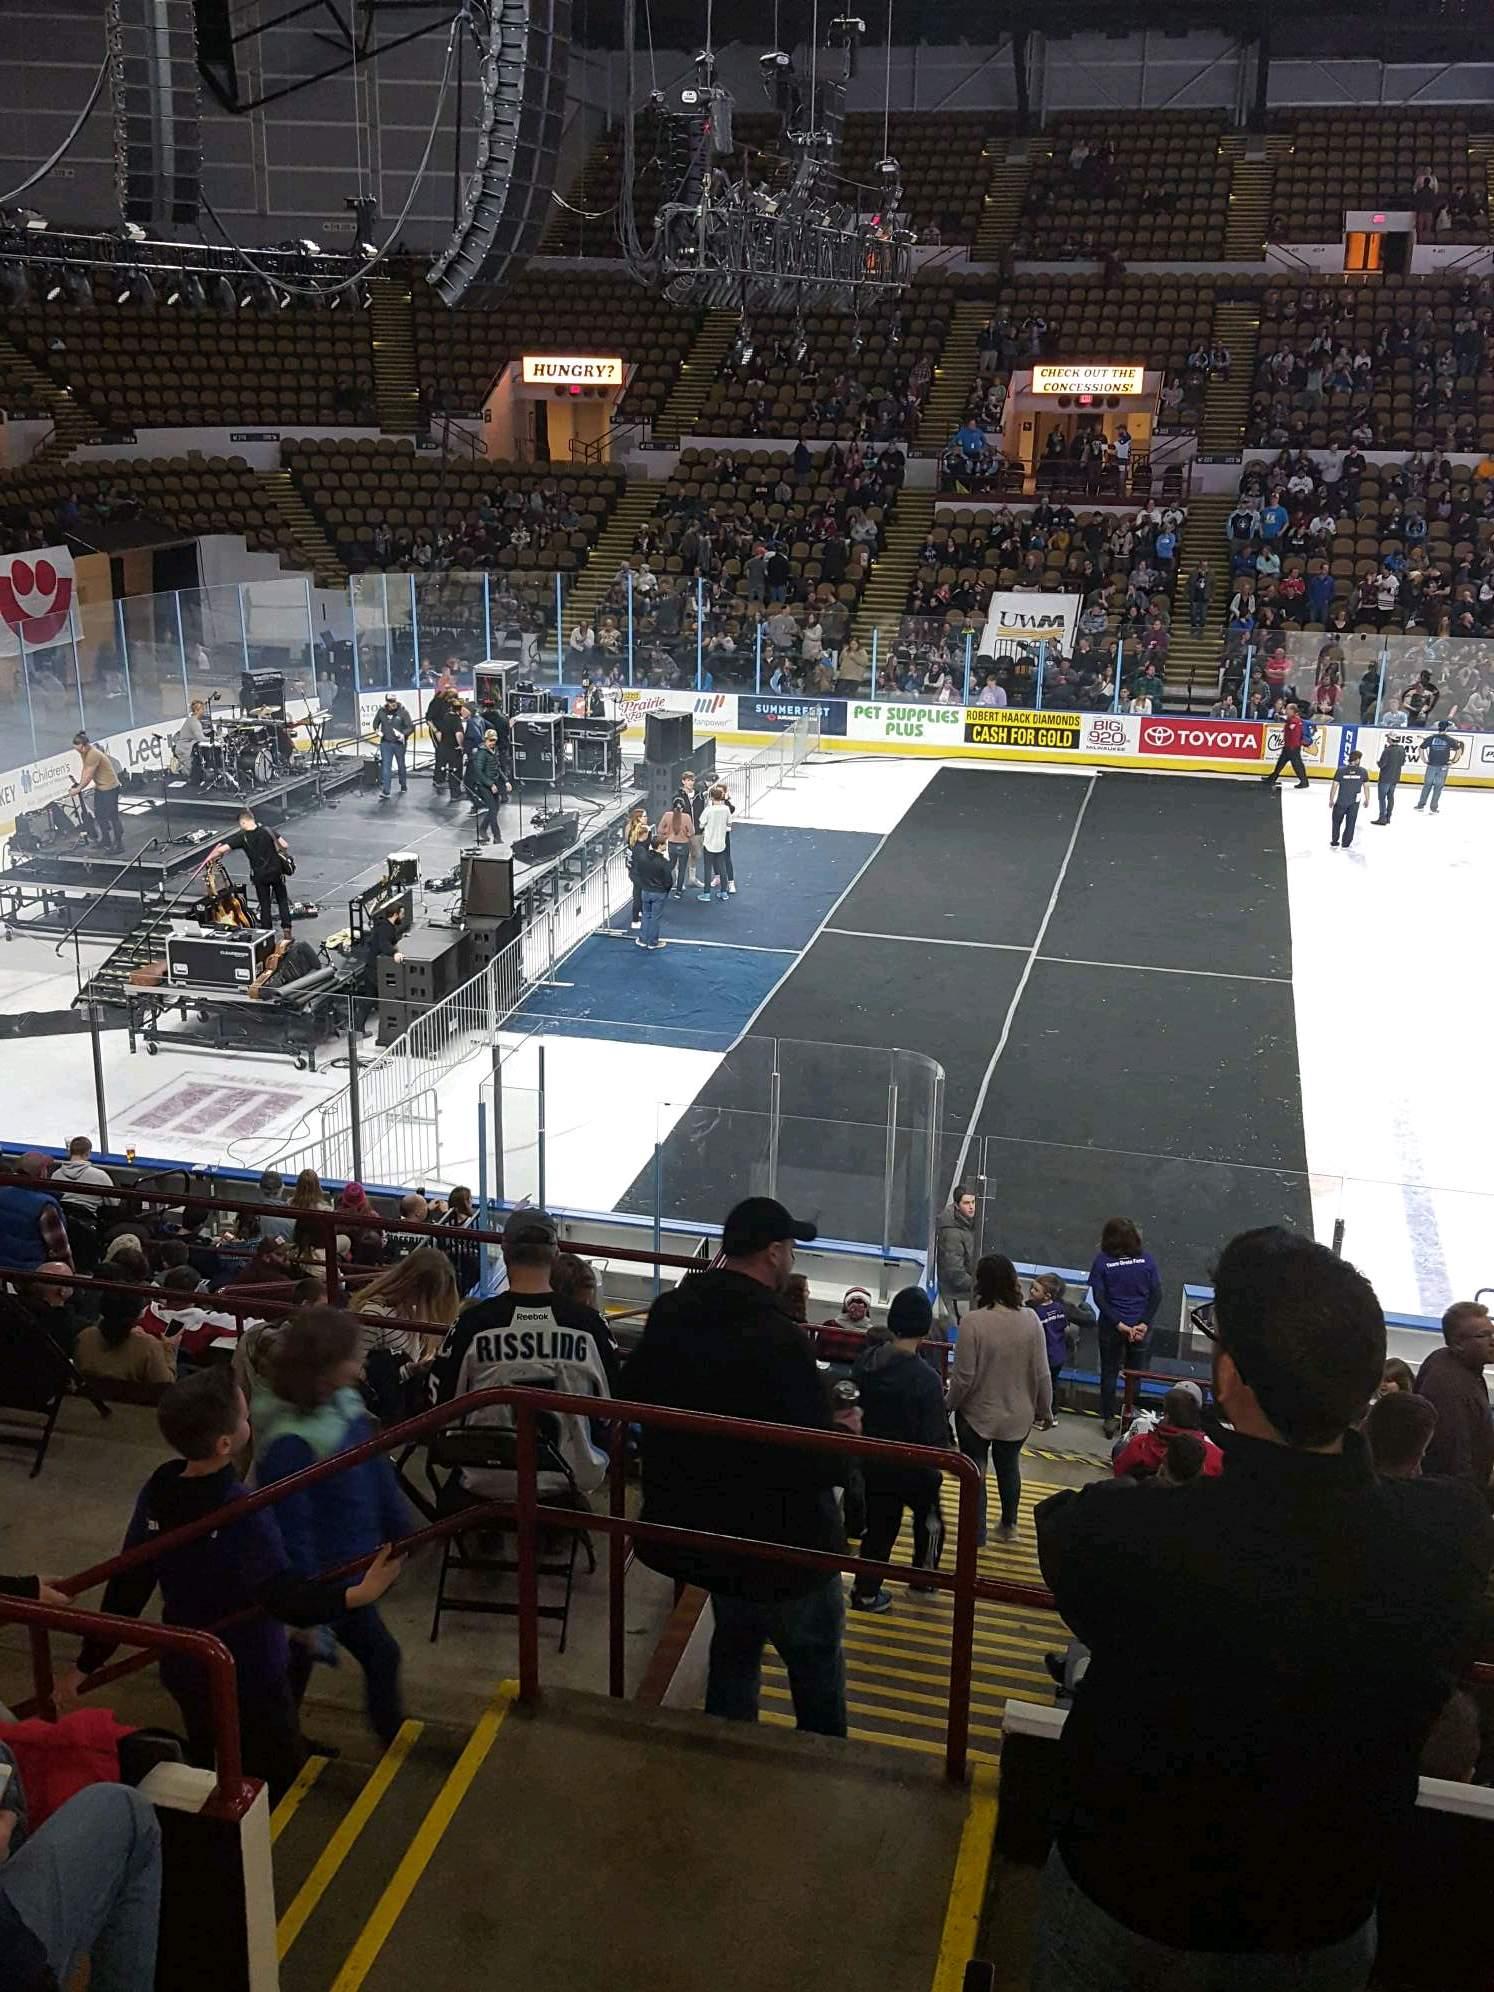 UW-Milwaukee Panther Arena Section 309 Row 5 Seat 12